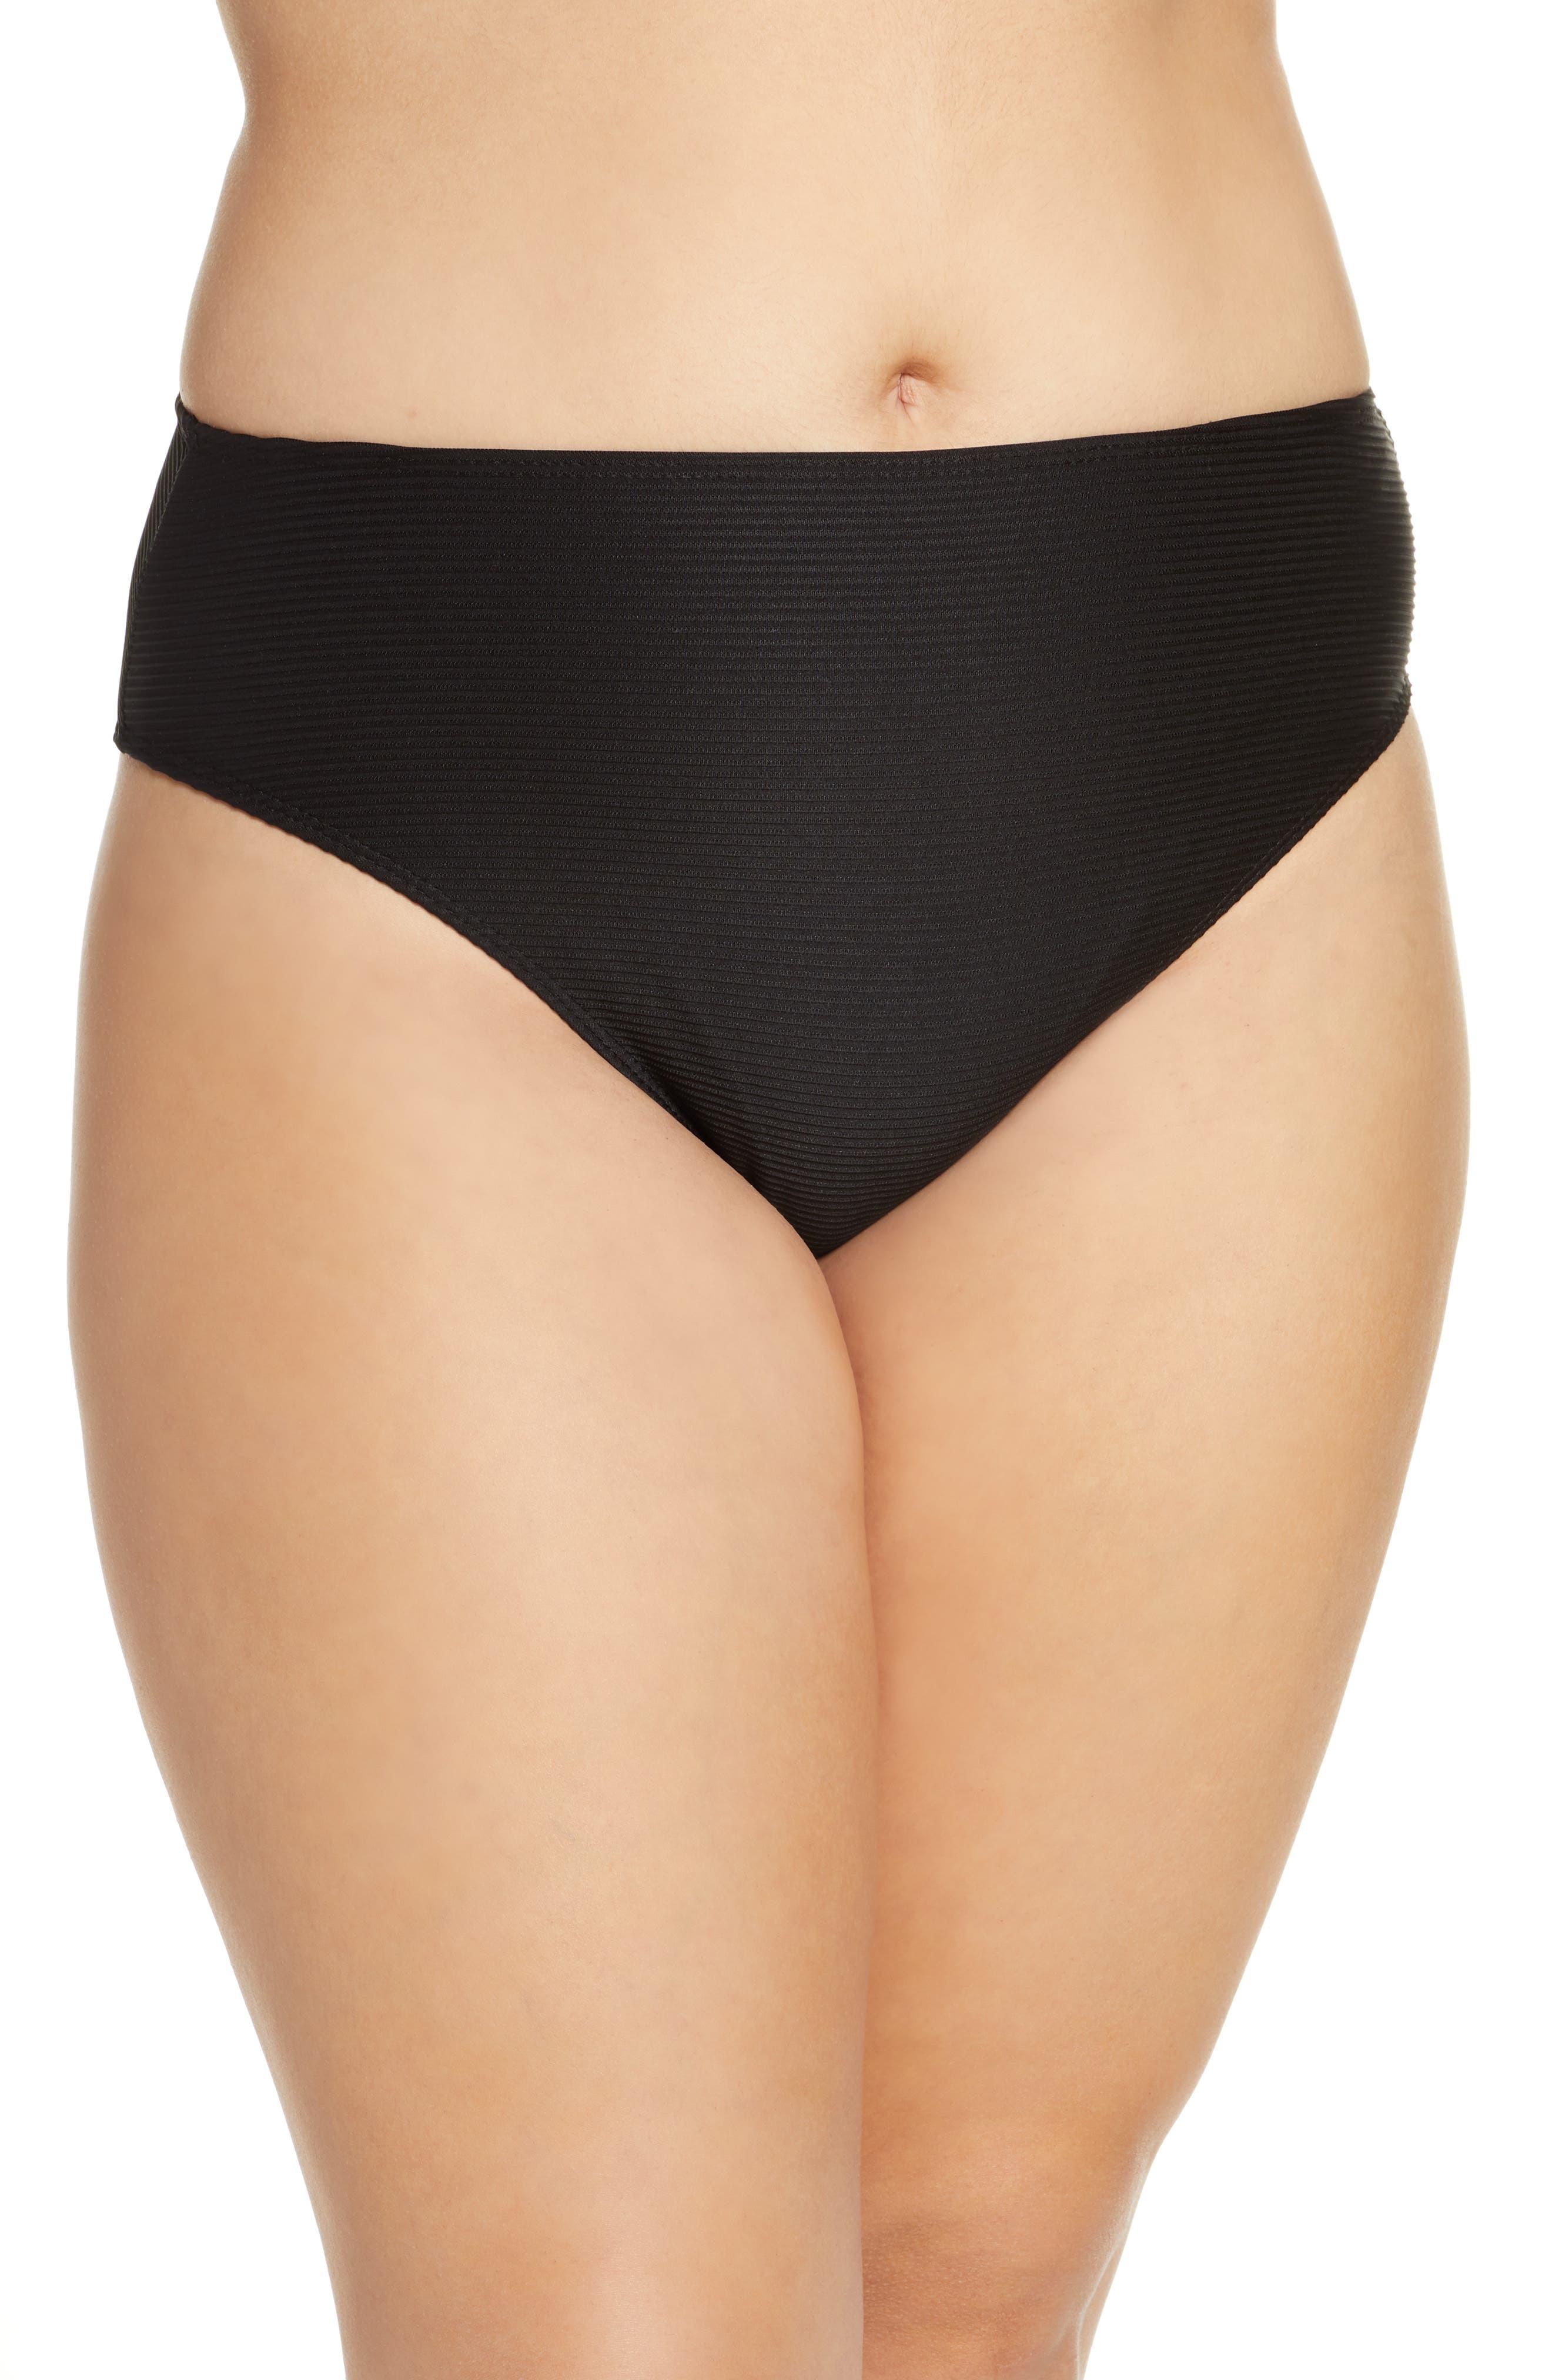 TOPSHOP, Ribbed High Waist Bikini Bottoms, Alternate thumbnail 5, color, BLACK